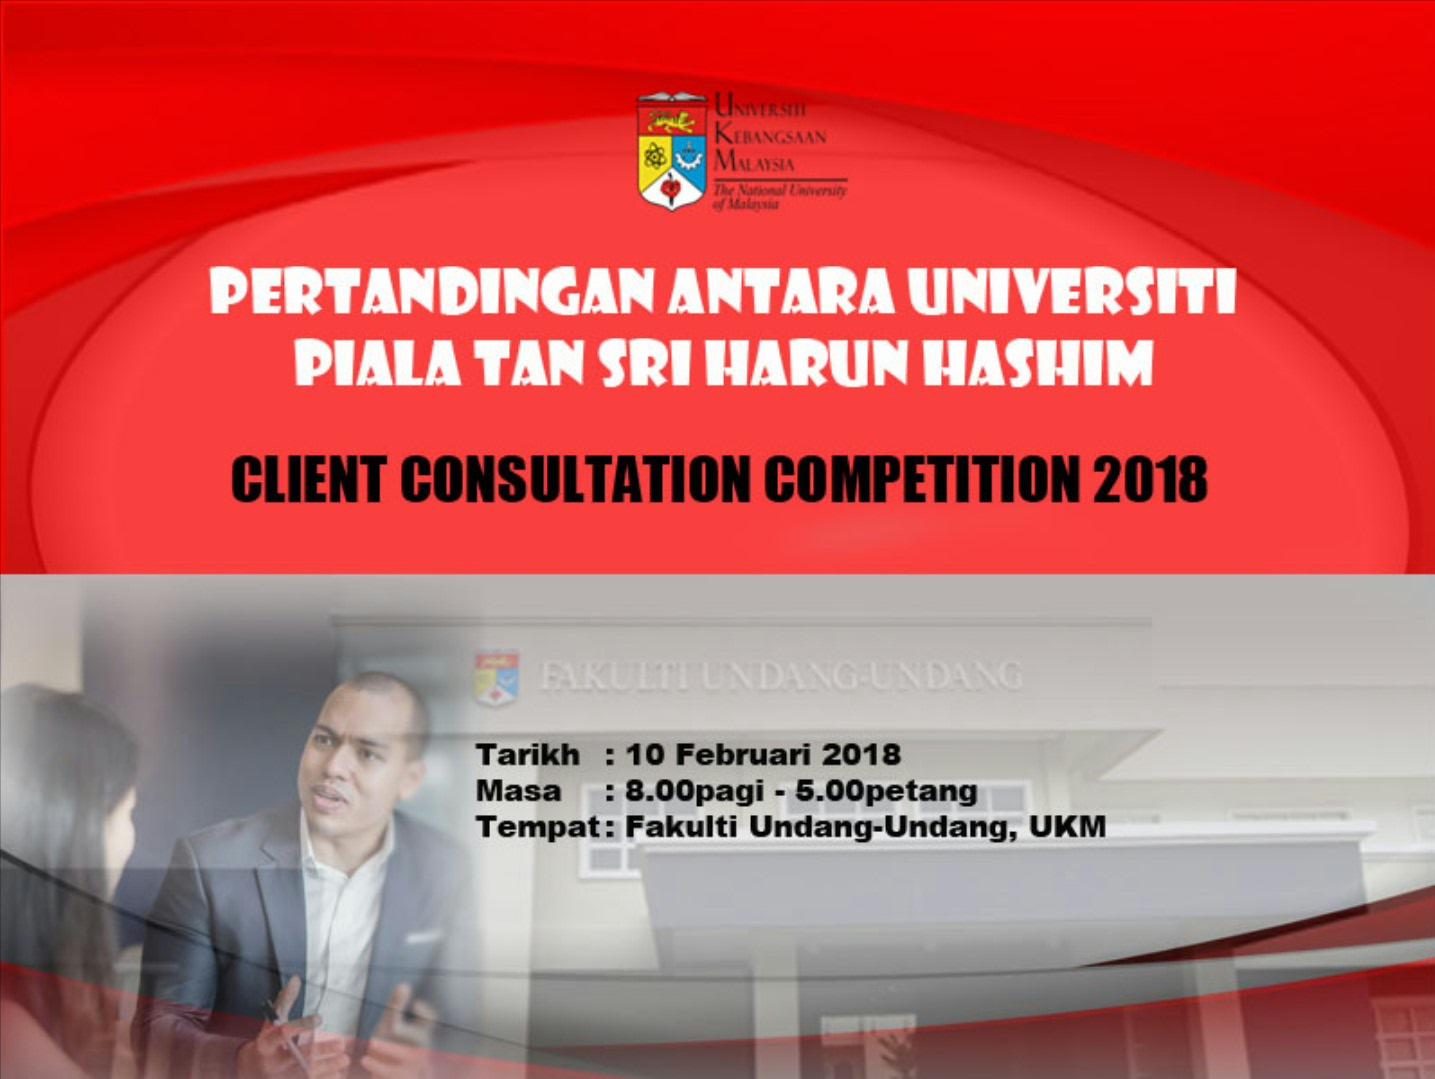 Pertandingan Antara Universiti Piala Tan Sri Harun Hashim Client Consultation Competition 2018